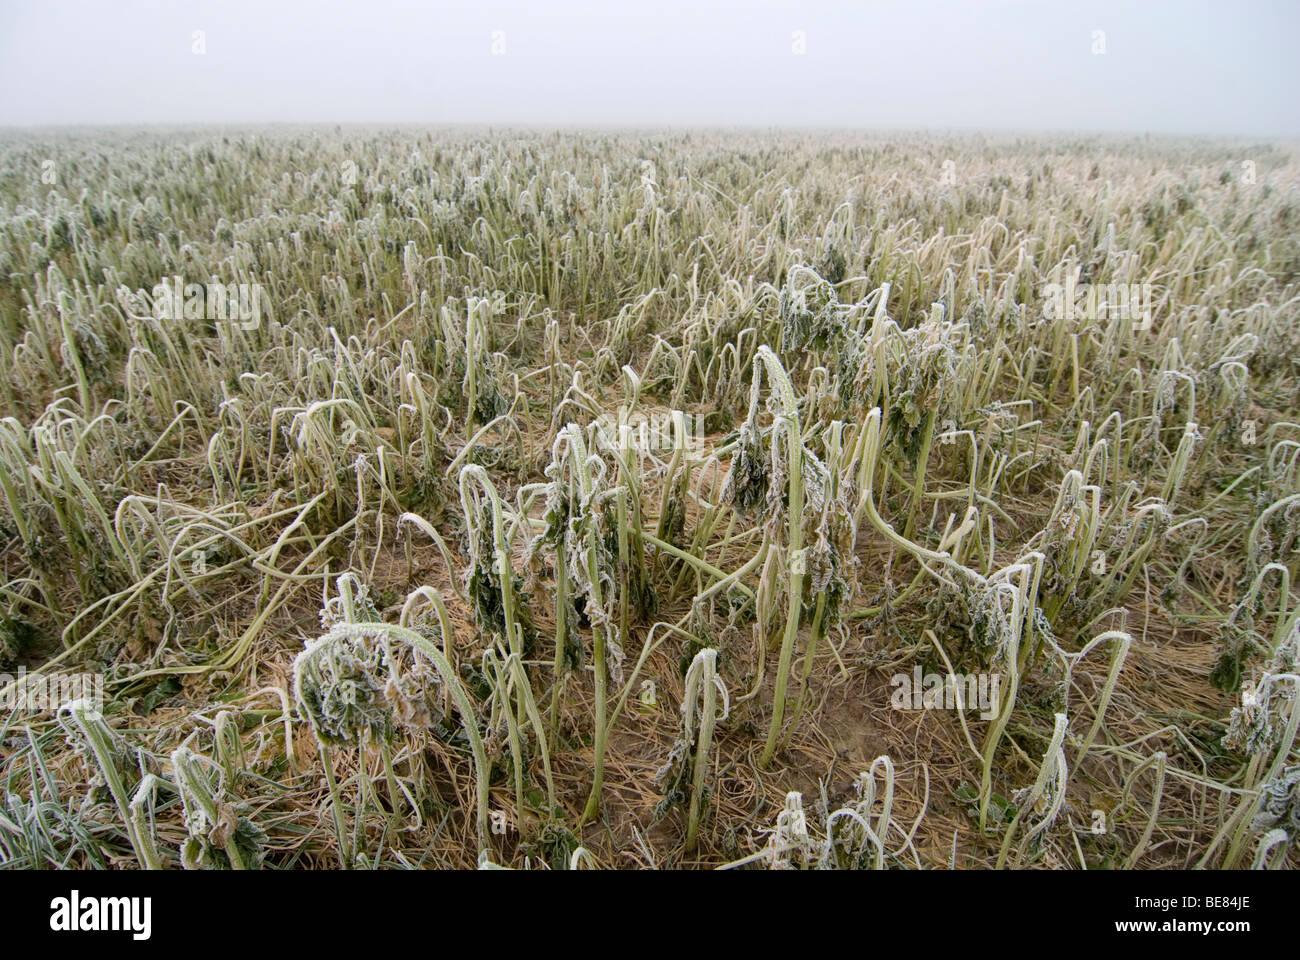 bladrammenas na vorst; oilseed radish in winter; - Stock Image